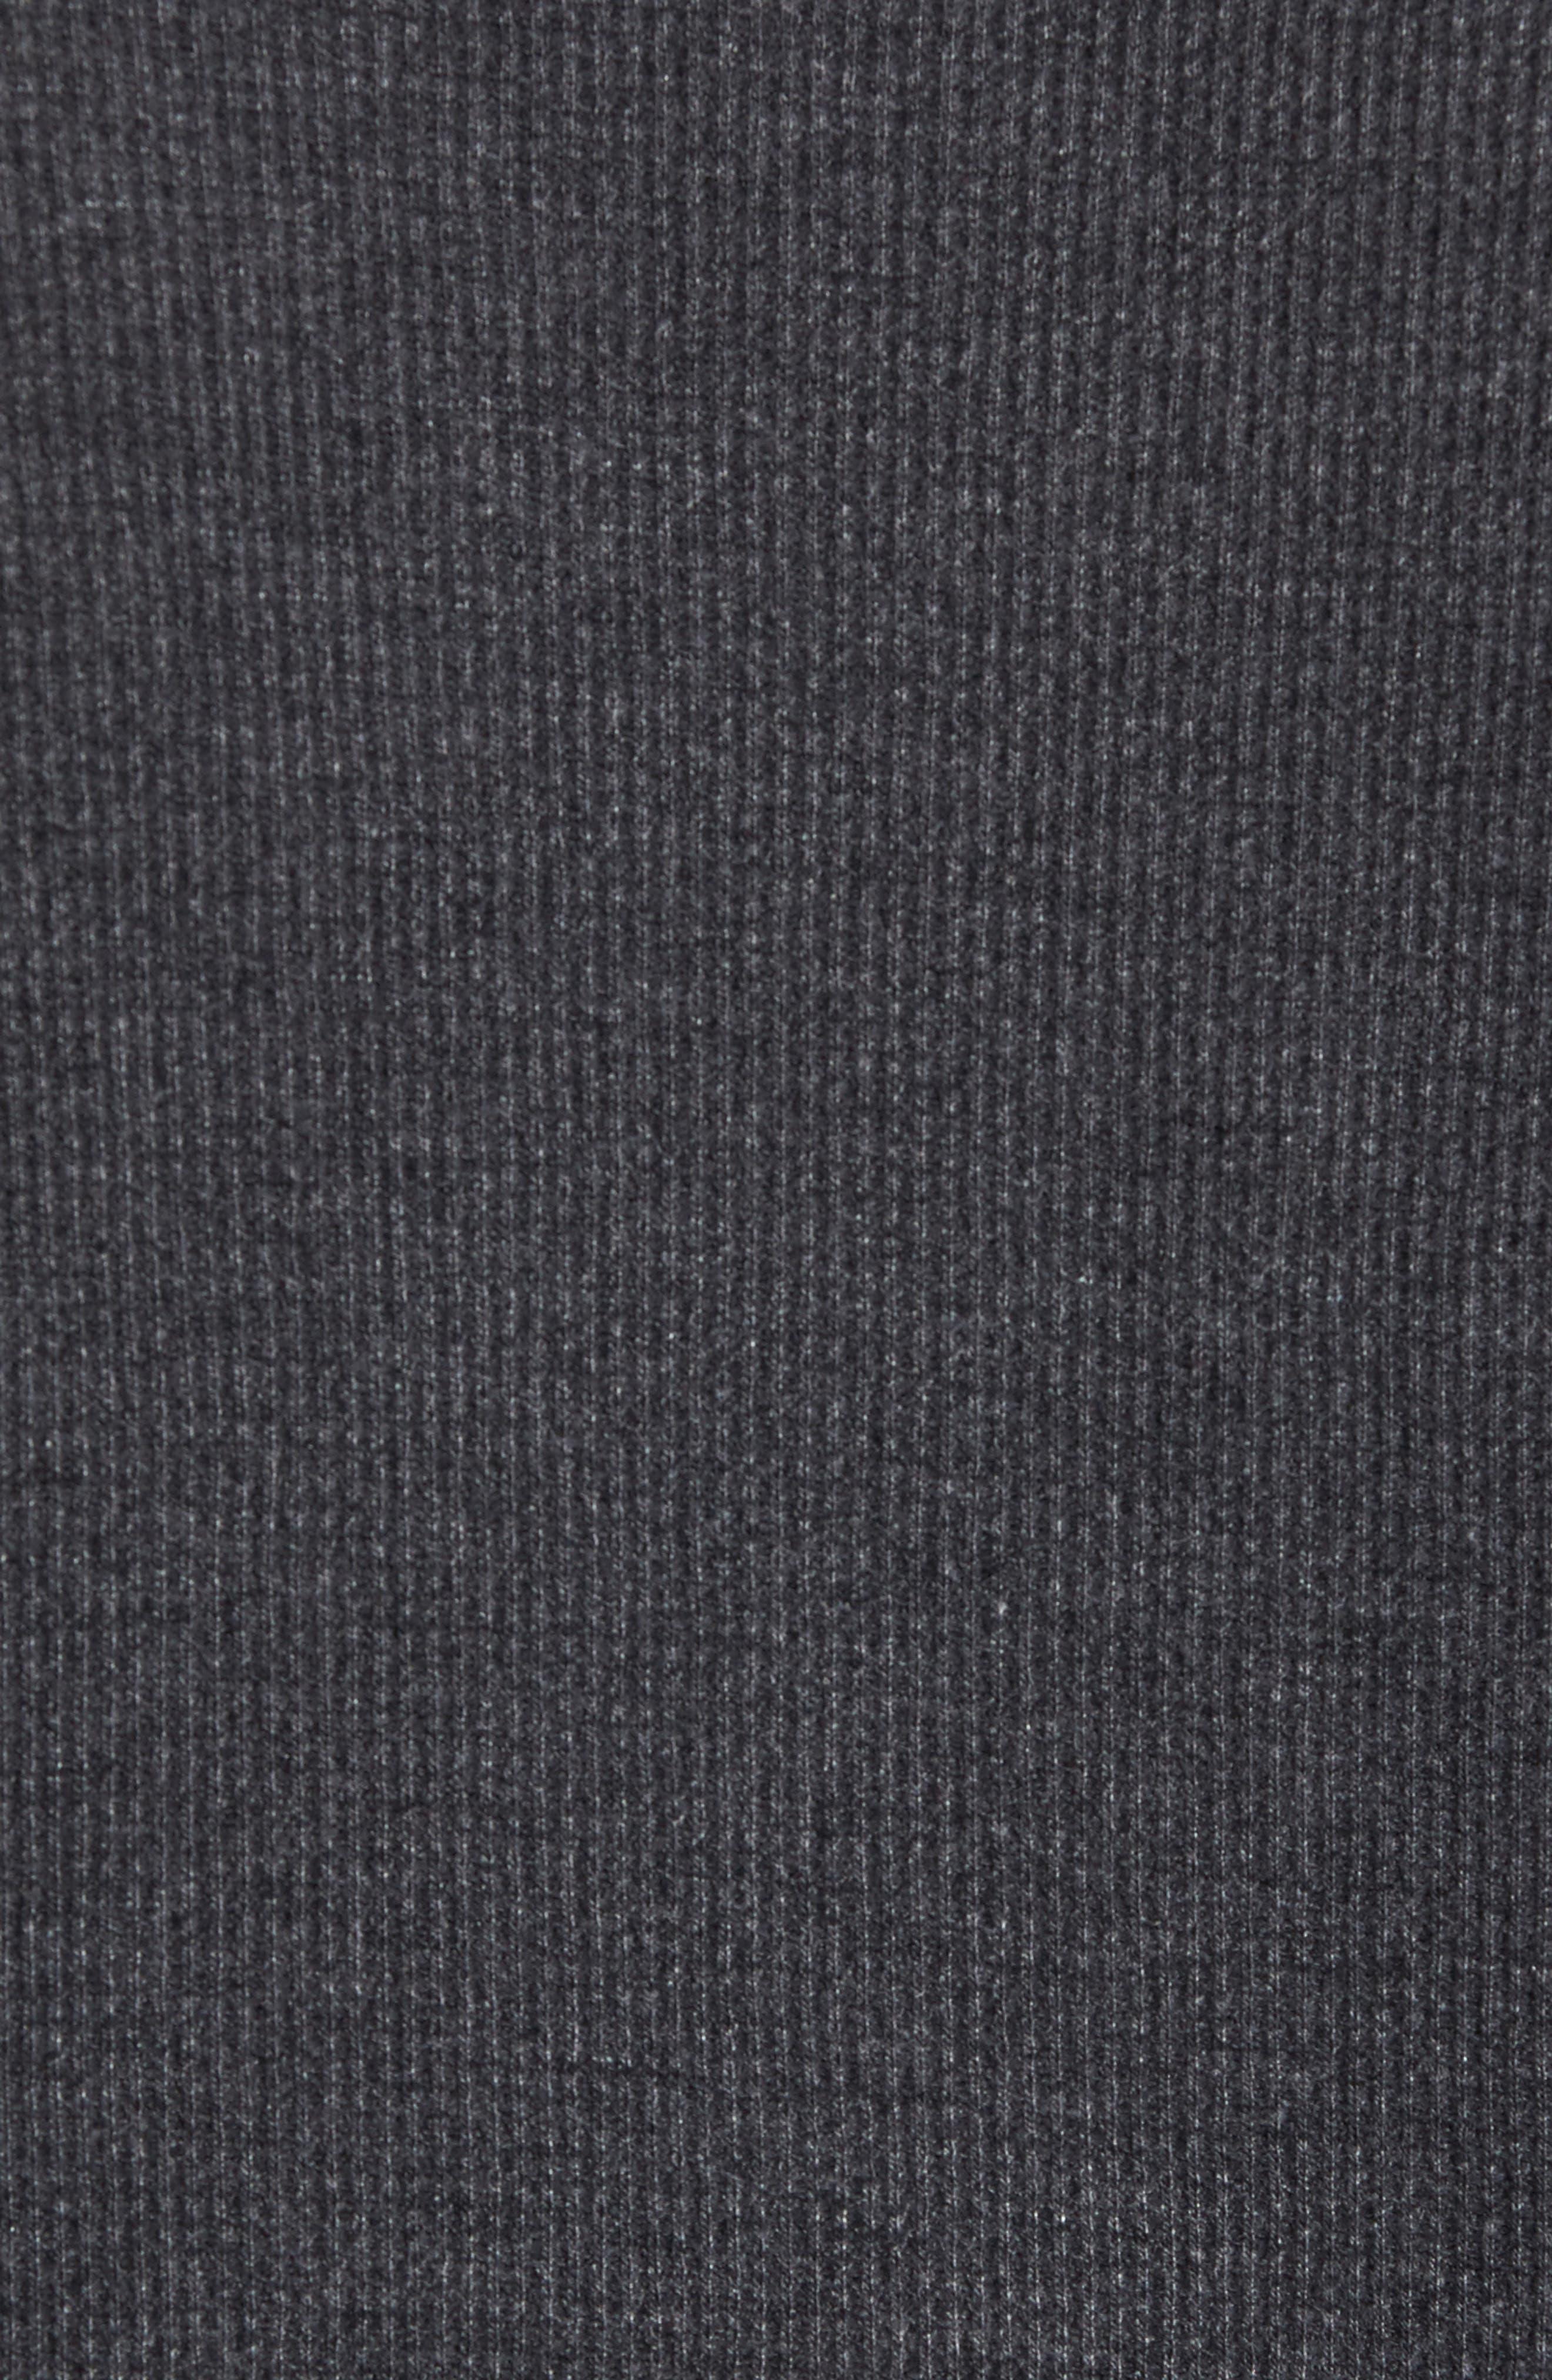 Boston Bruins Embroidered Long Sleeve Thermal Shirt,                             Alternate thumbnail 5, color,                             Black